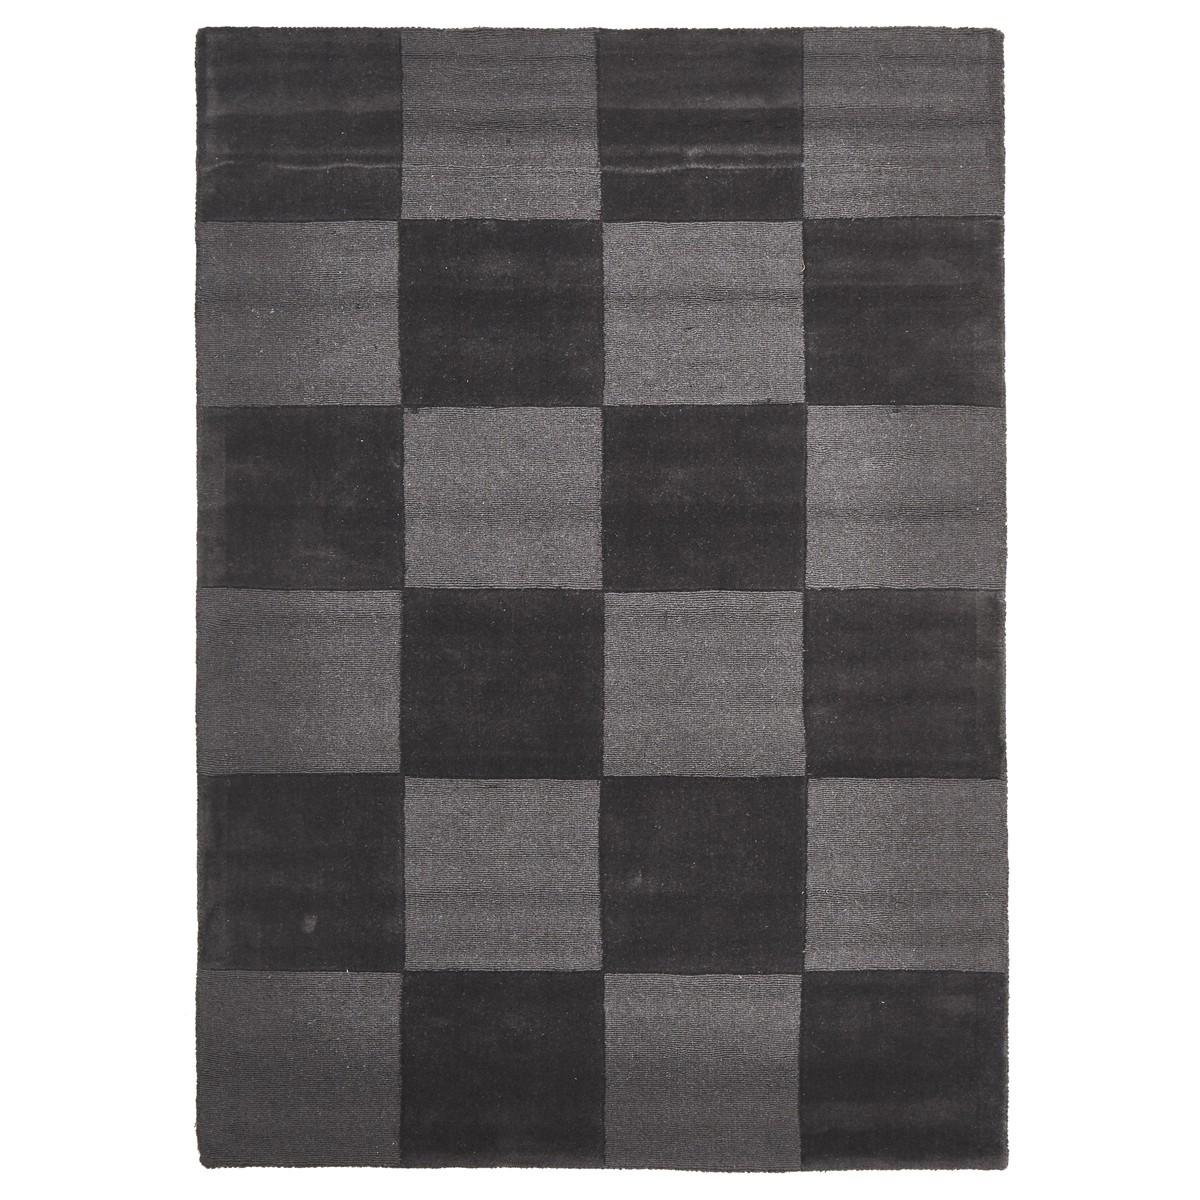 Evangeline Hand Loomed Modern Wool Rug, 165x115cm, Charcoal